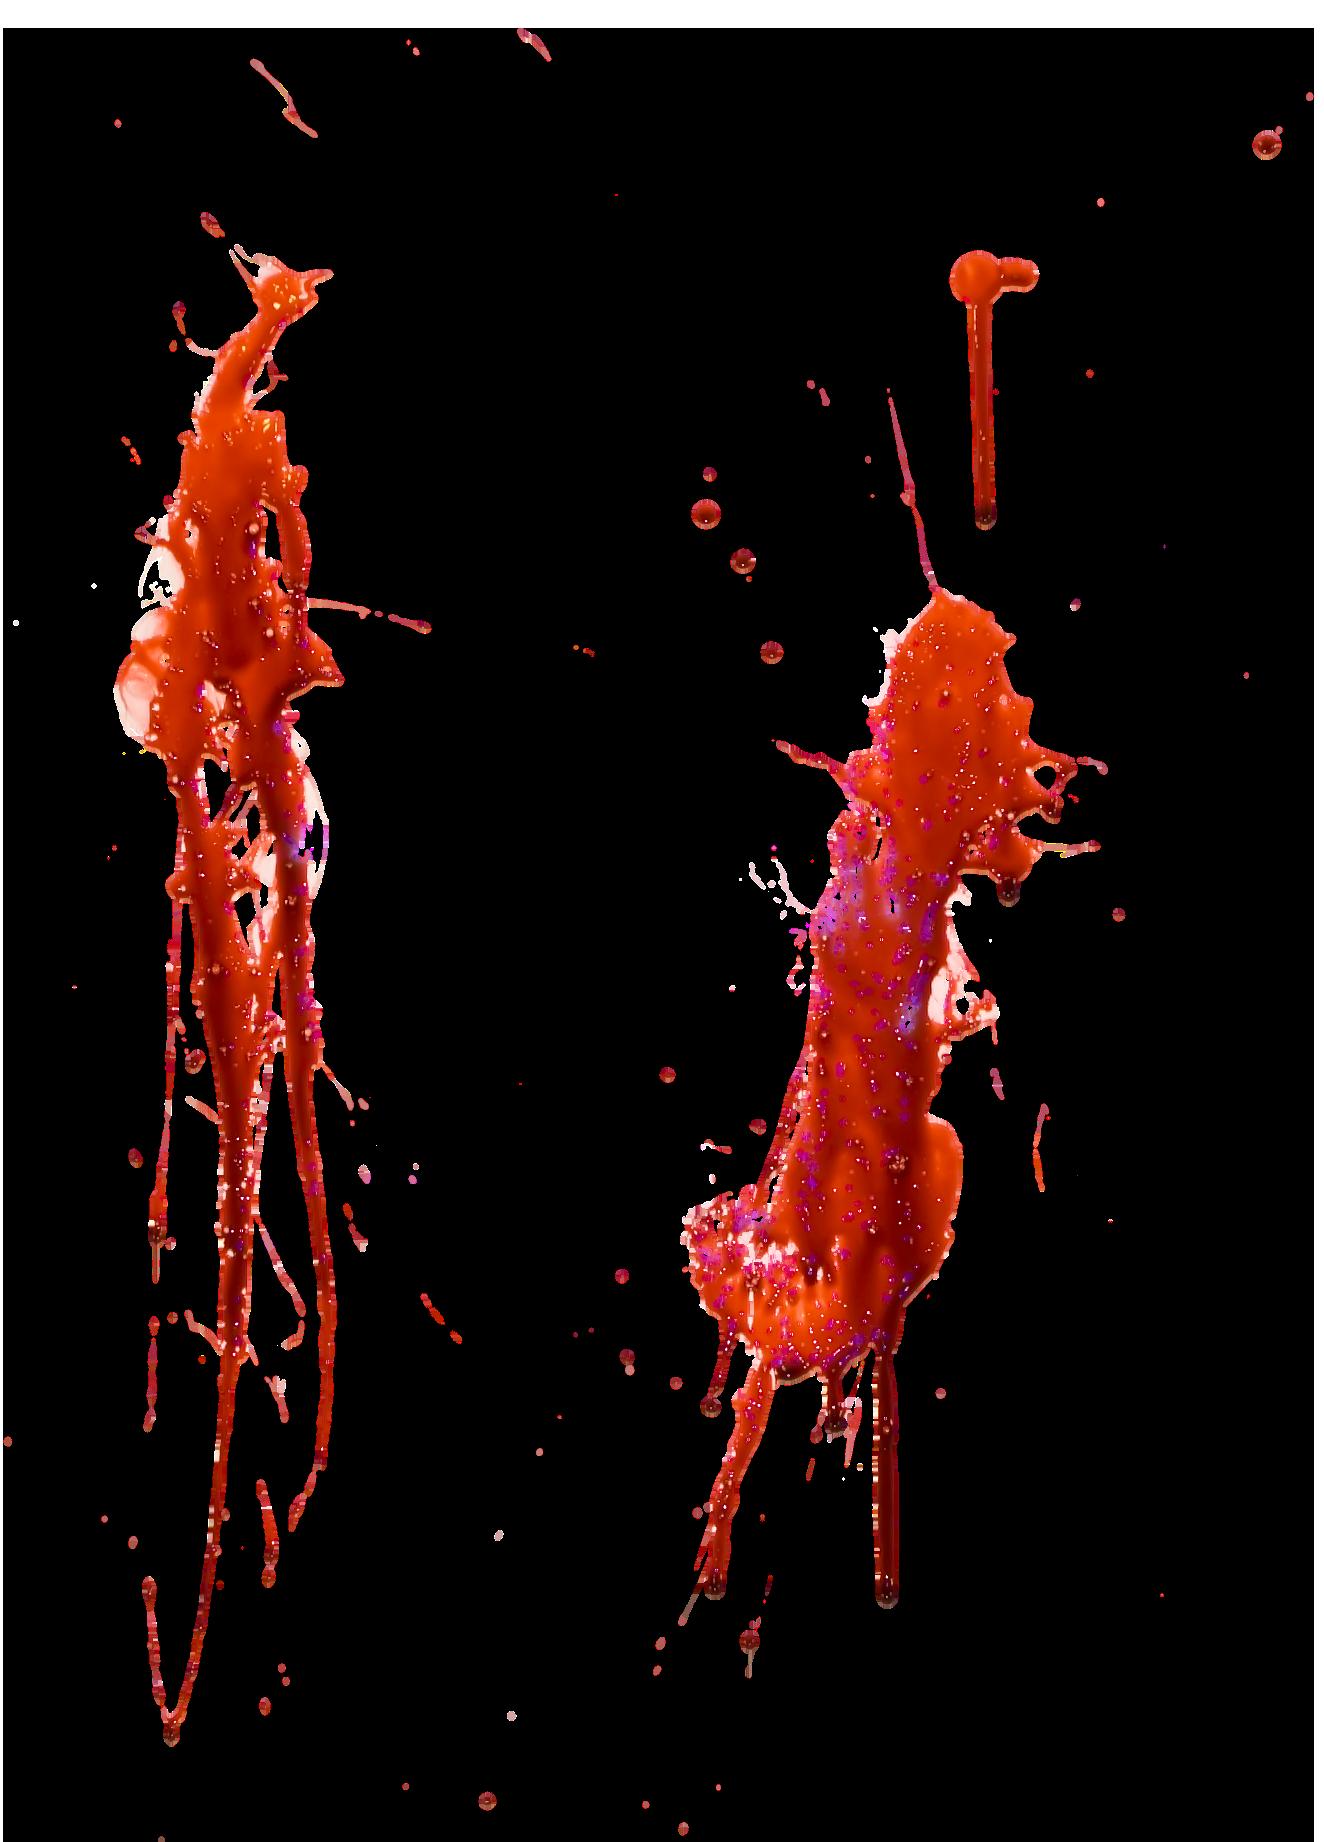 Blood HD PNG - 94809